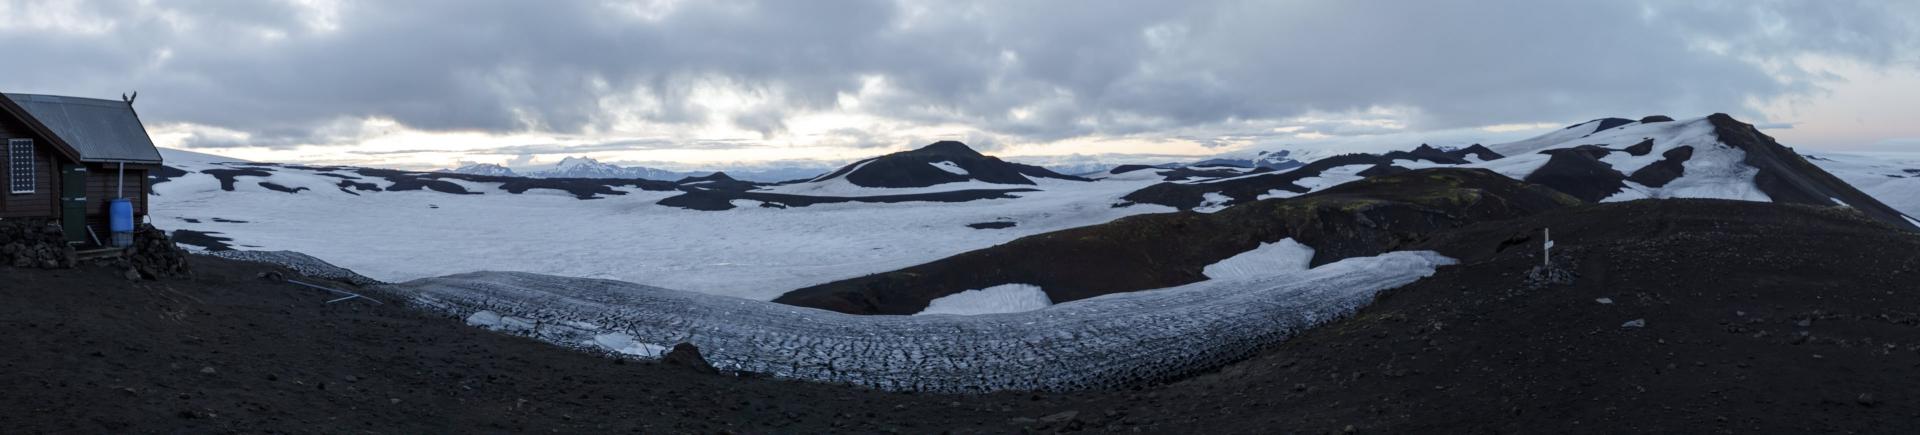 Panorama Richtung Norden